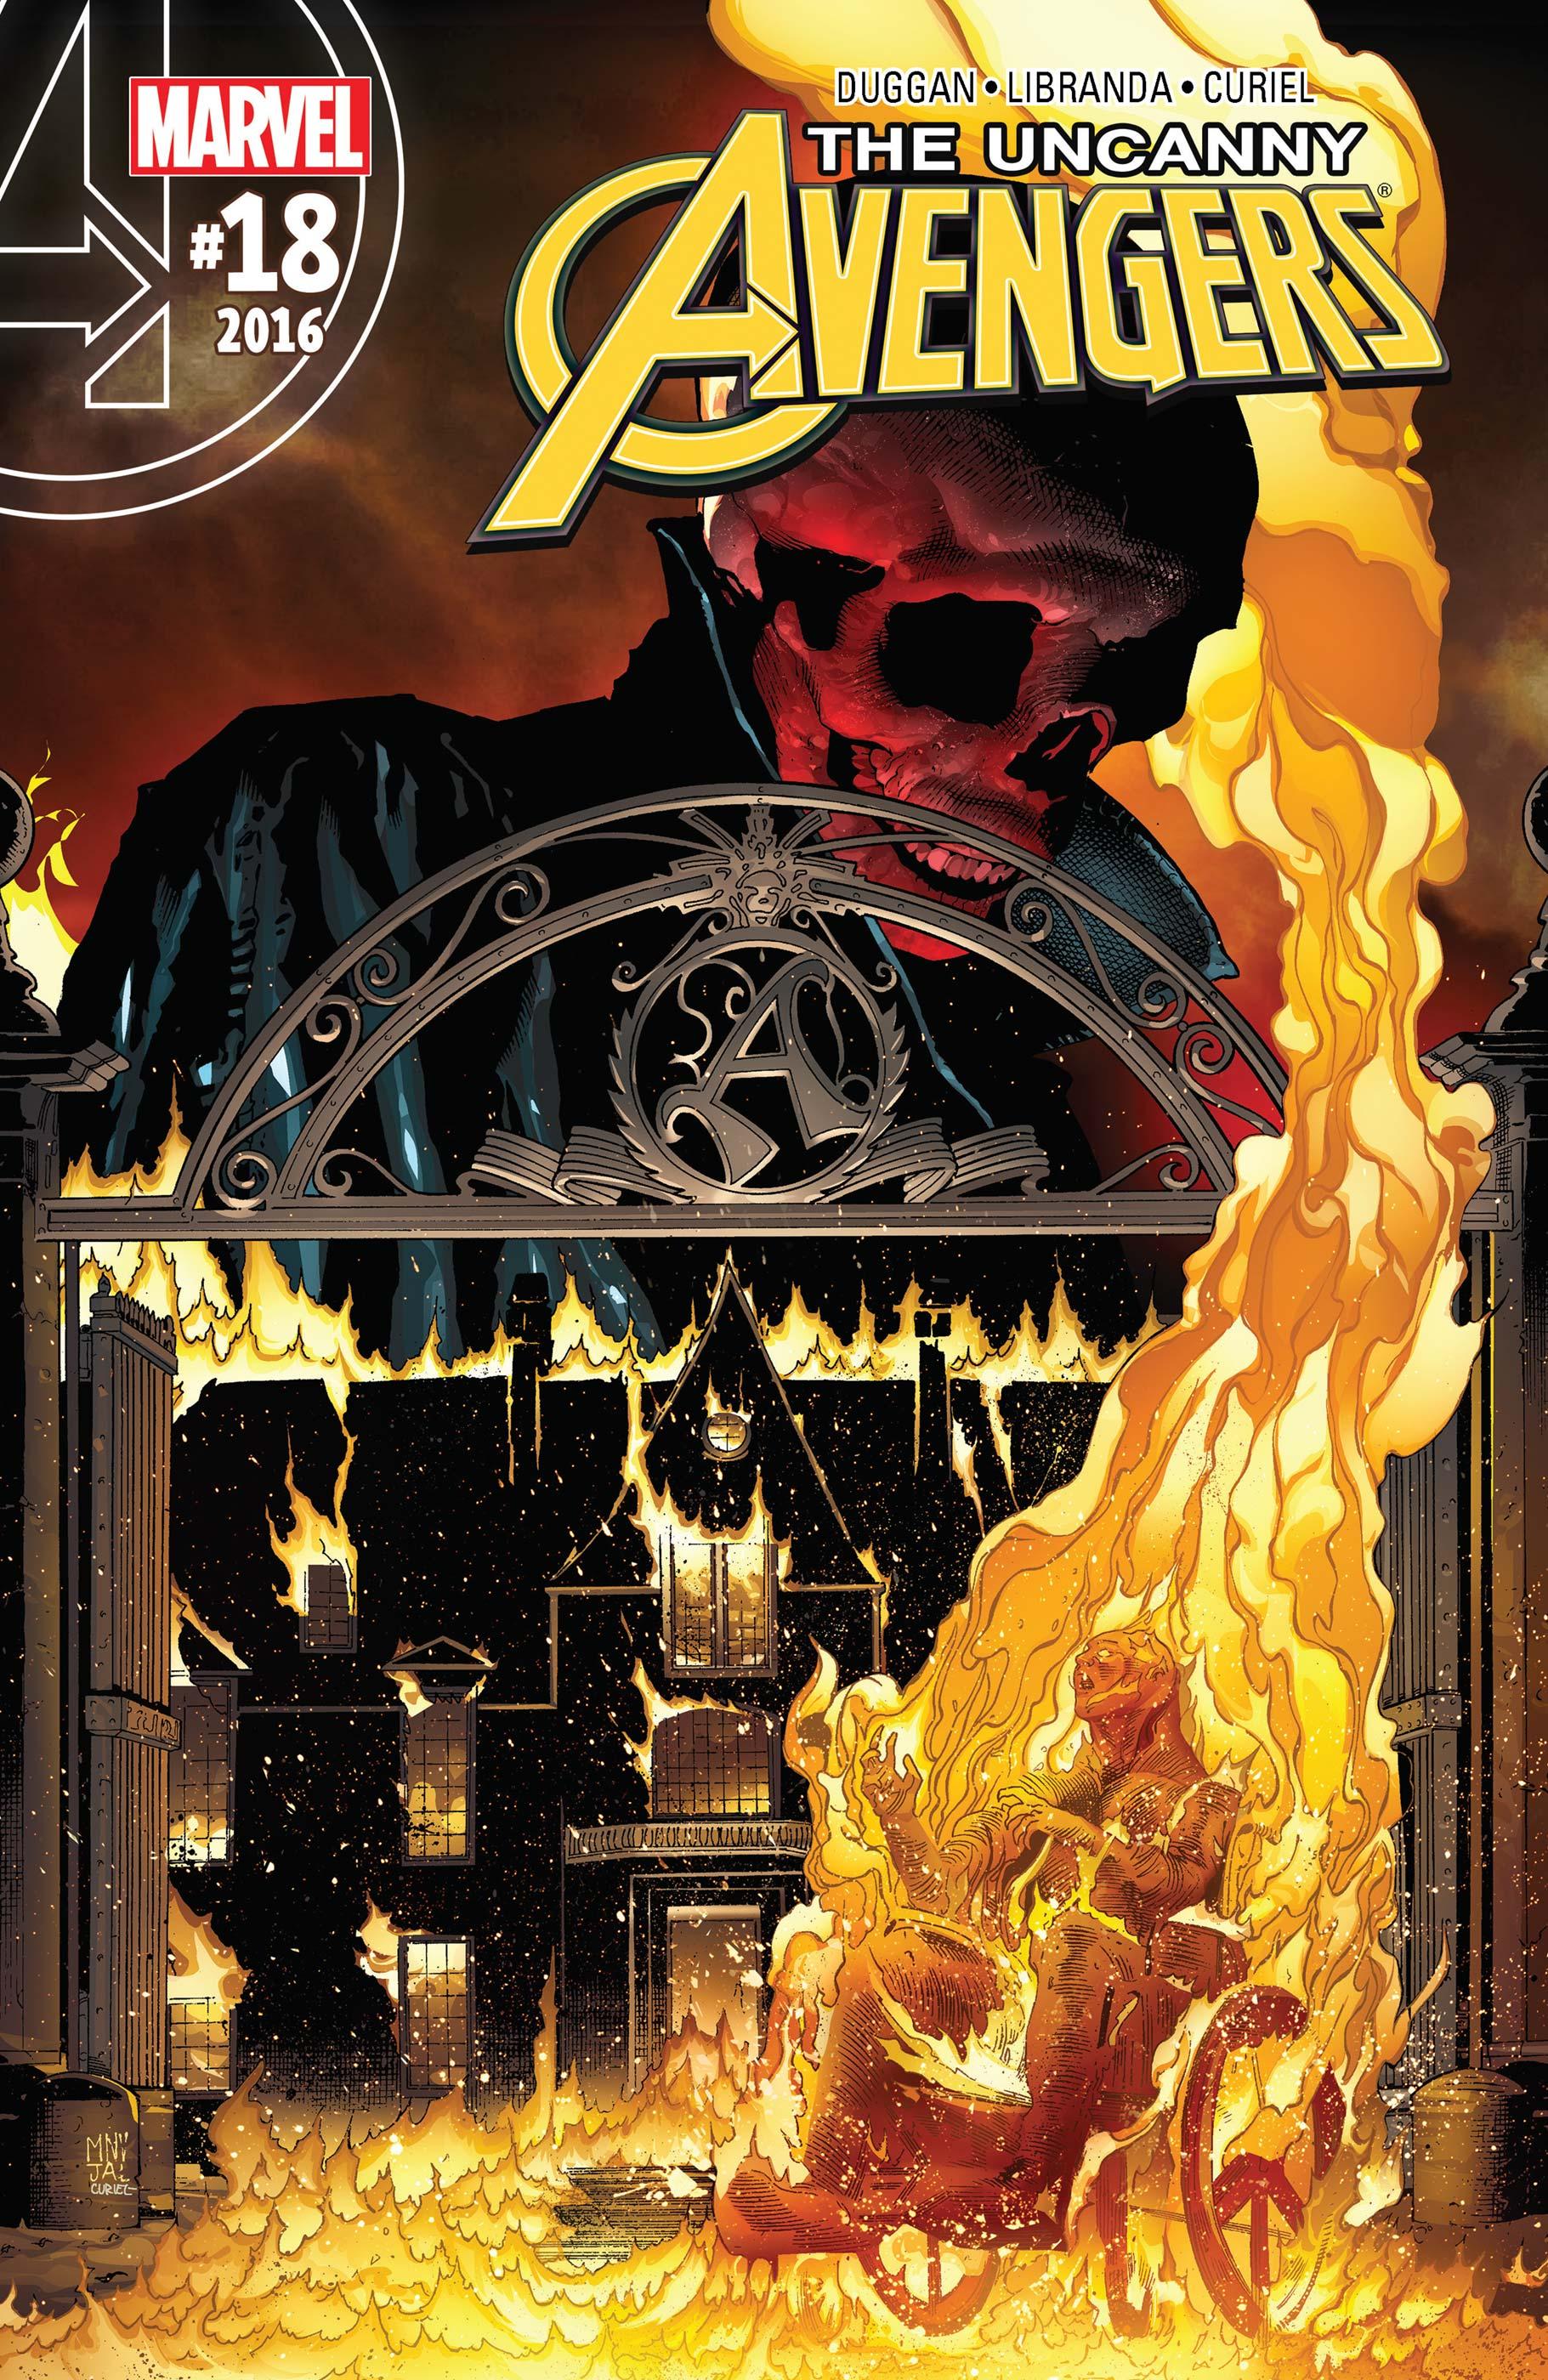 Uncanny Avengers (2015) #18